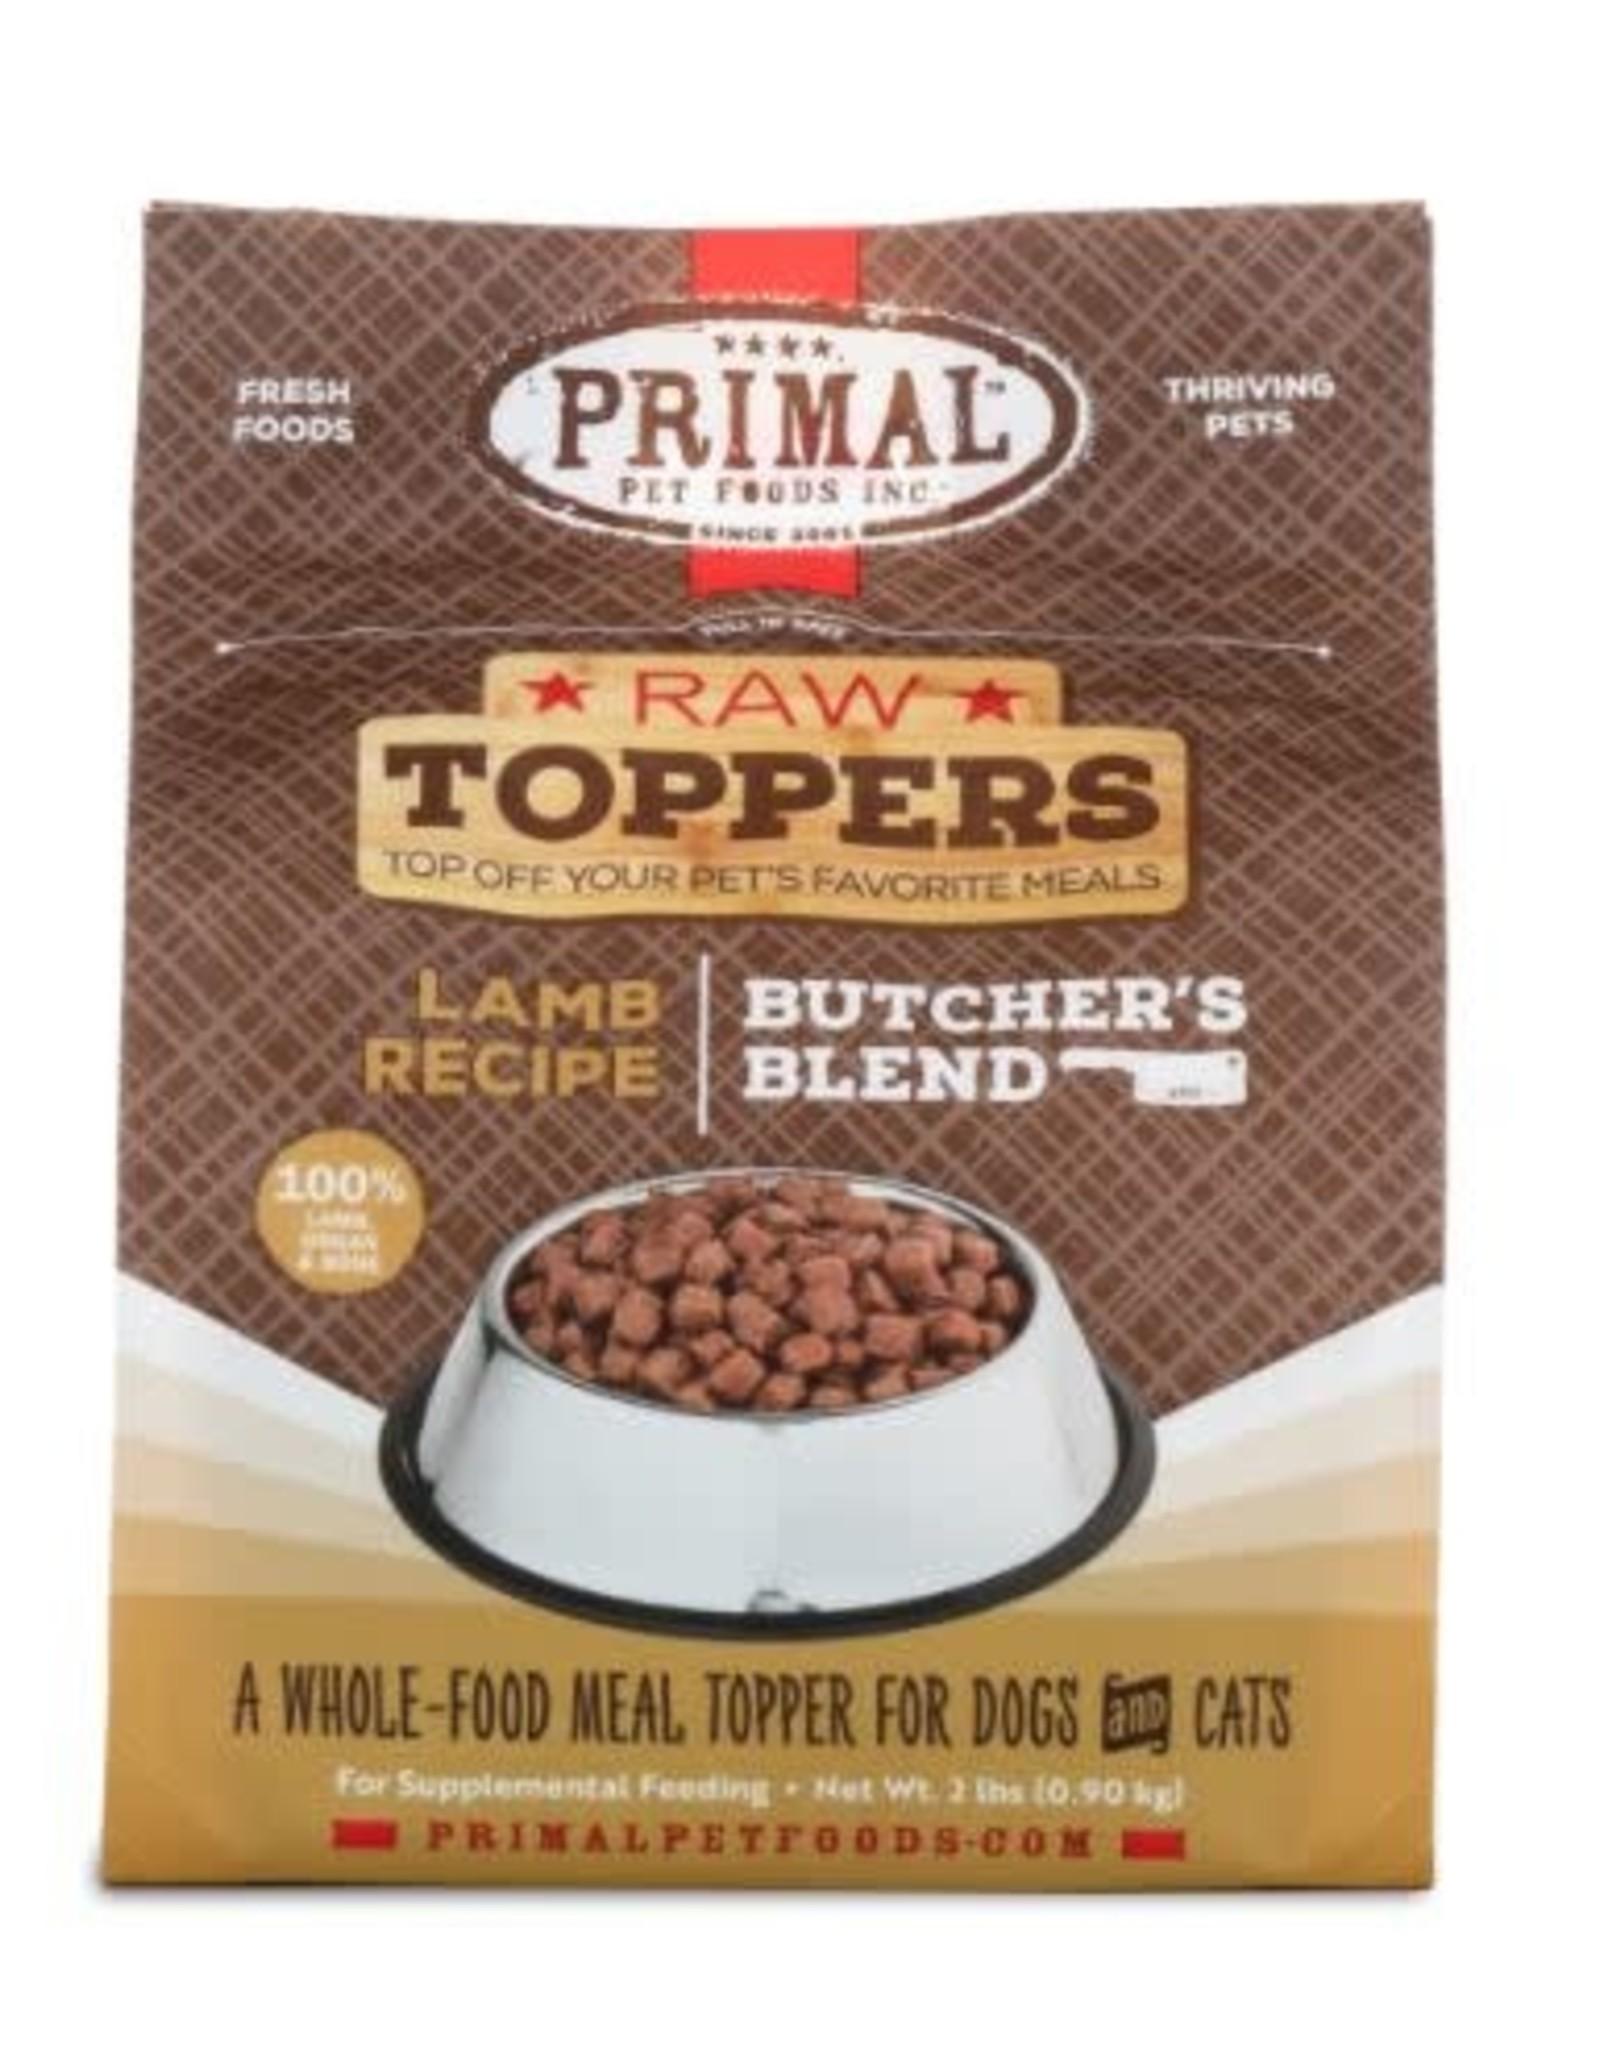 Primal Pet Foods Primal Lamb Market Mix Topper 5lb